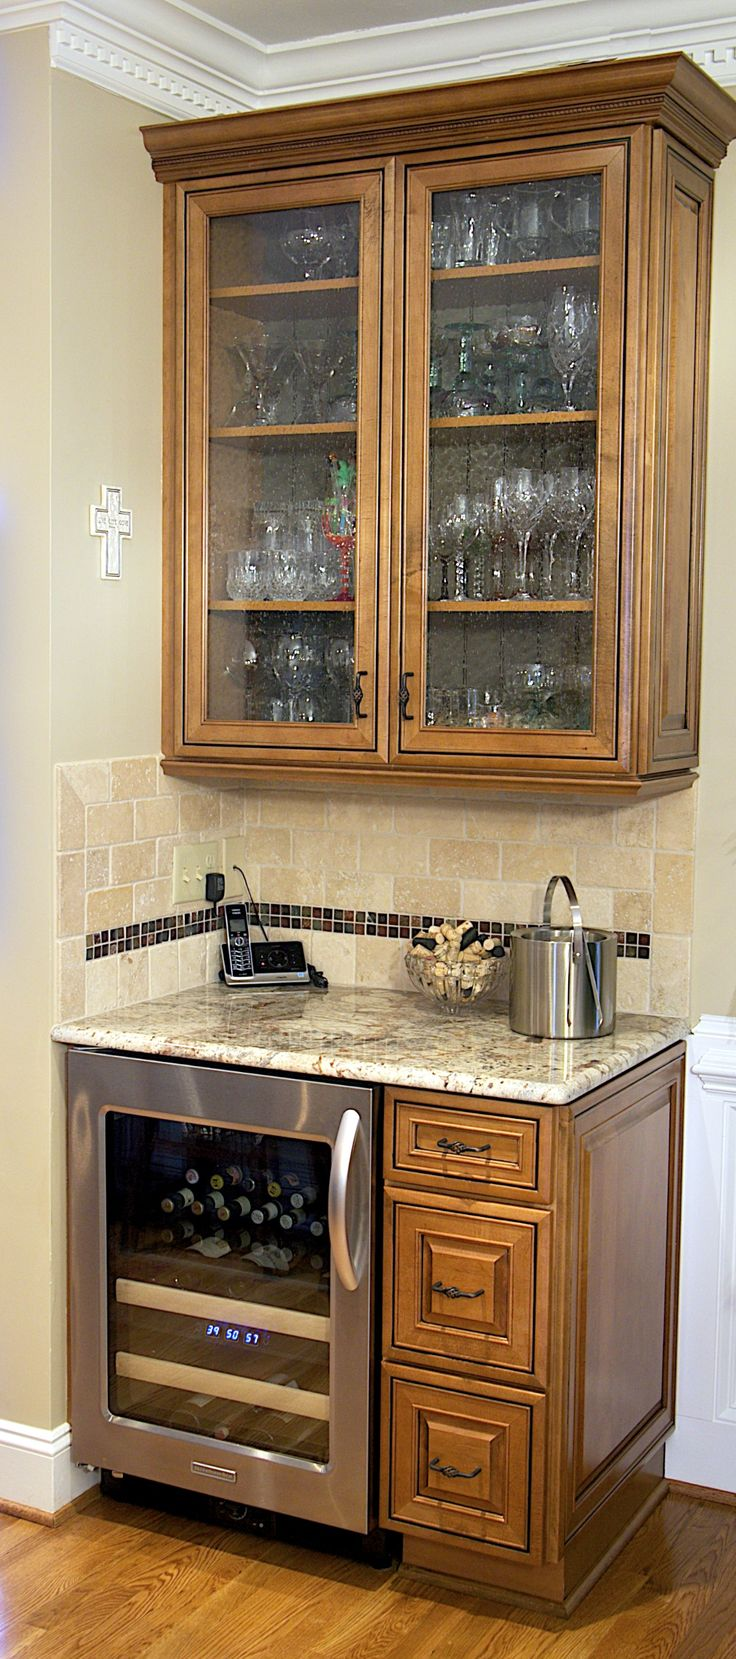 kitchen beverage center | KitchenAid refrigerator keeps beverages at the perfect temperature.